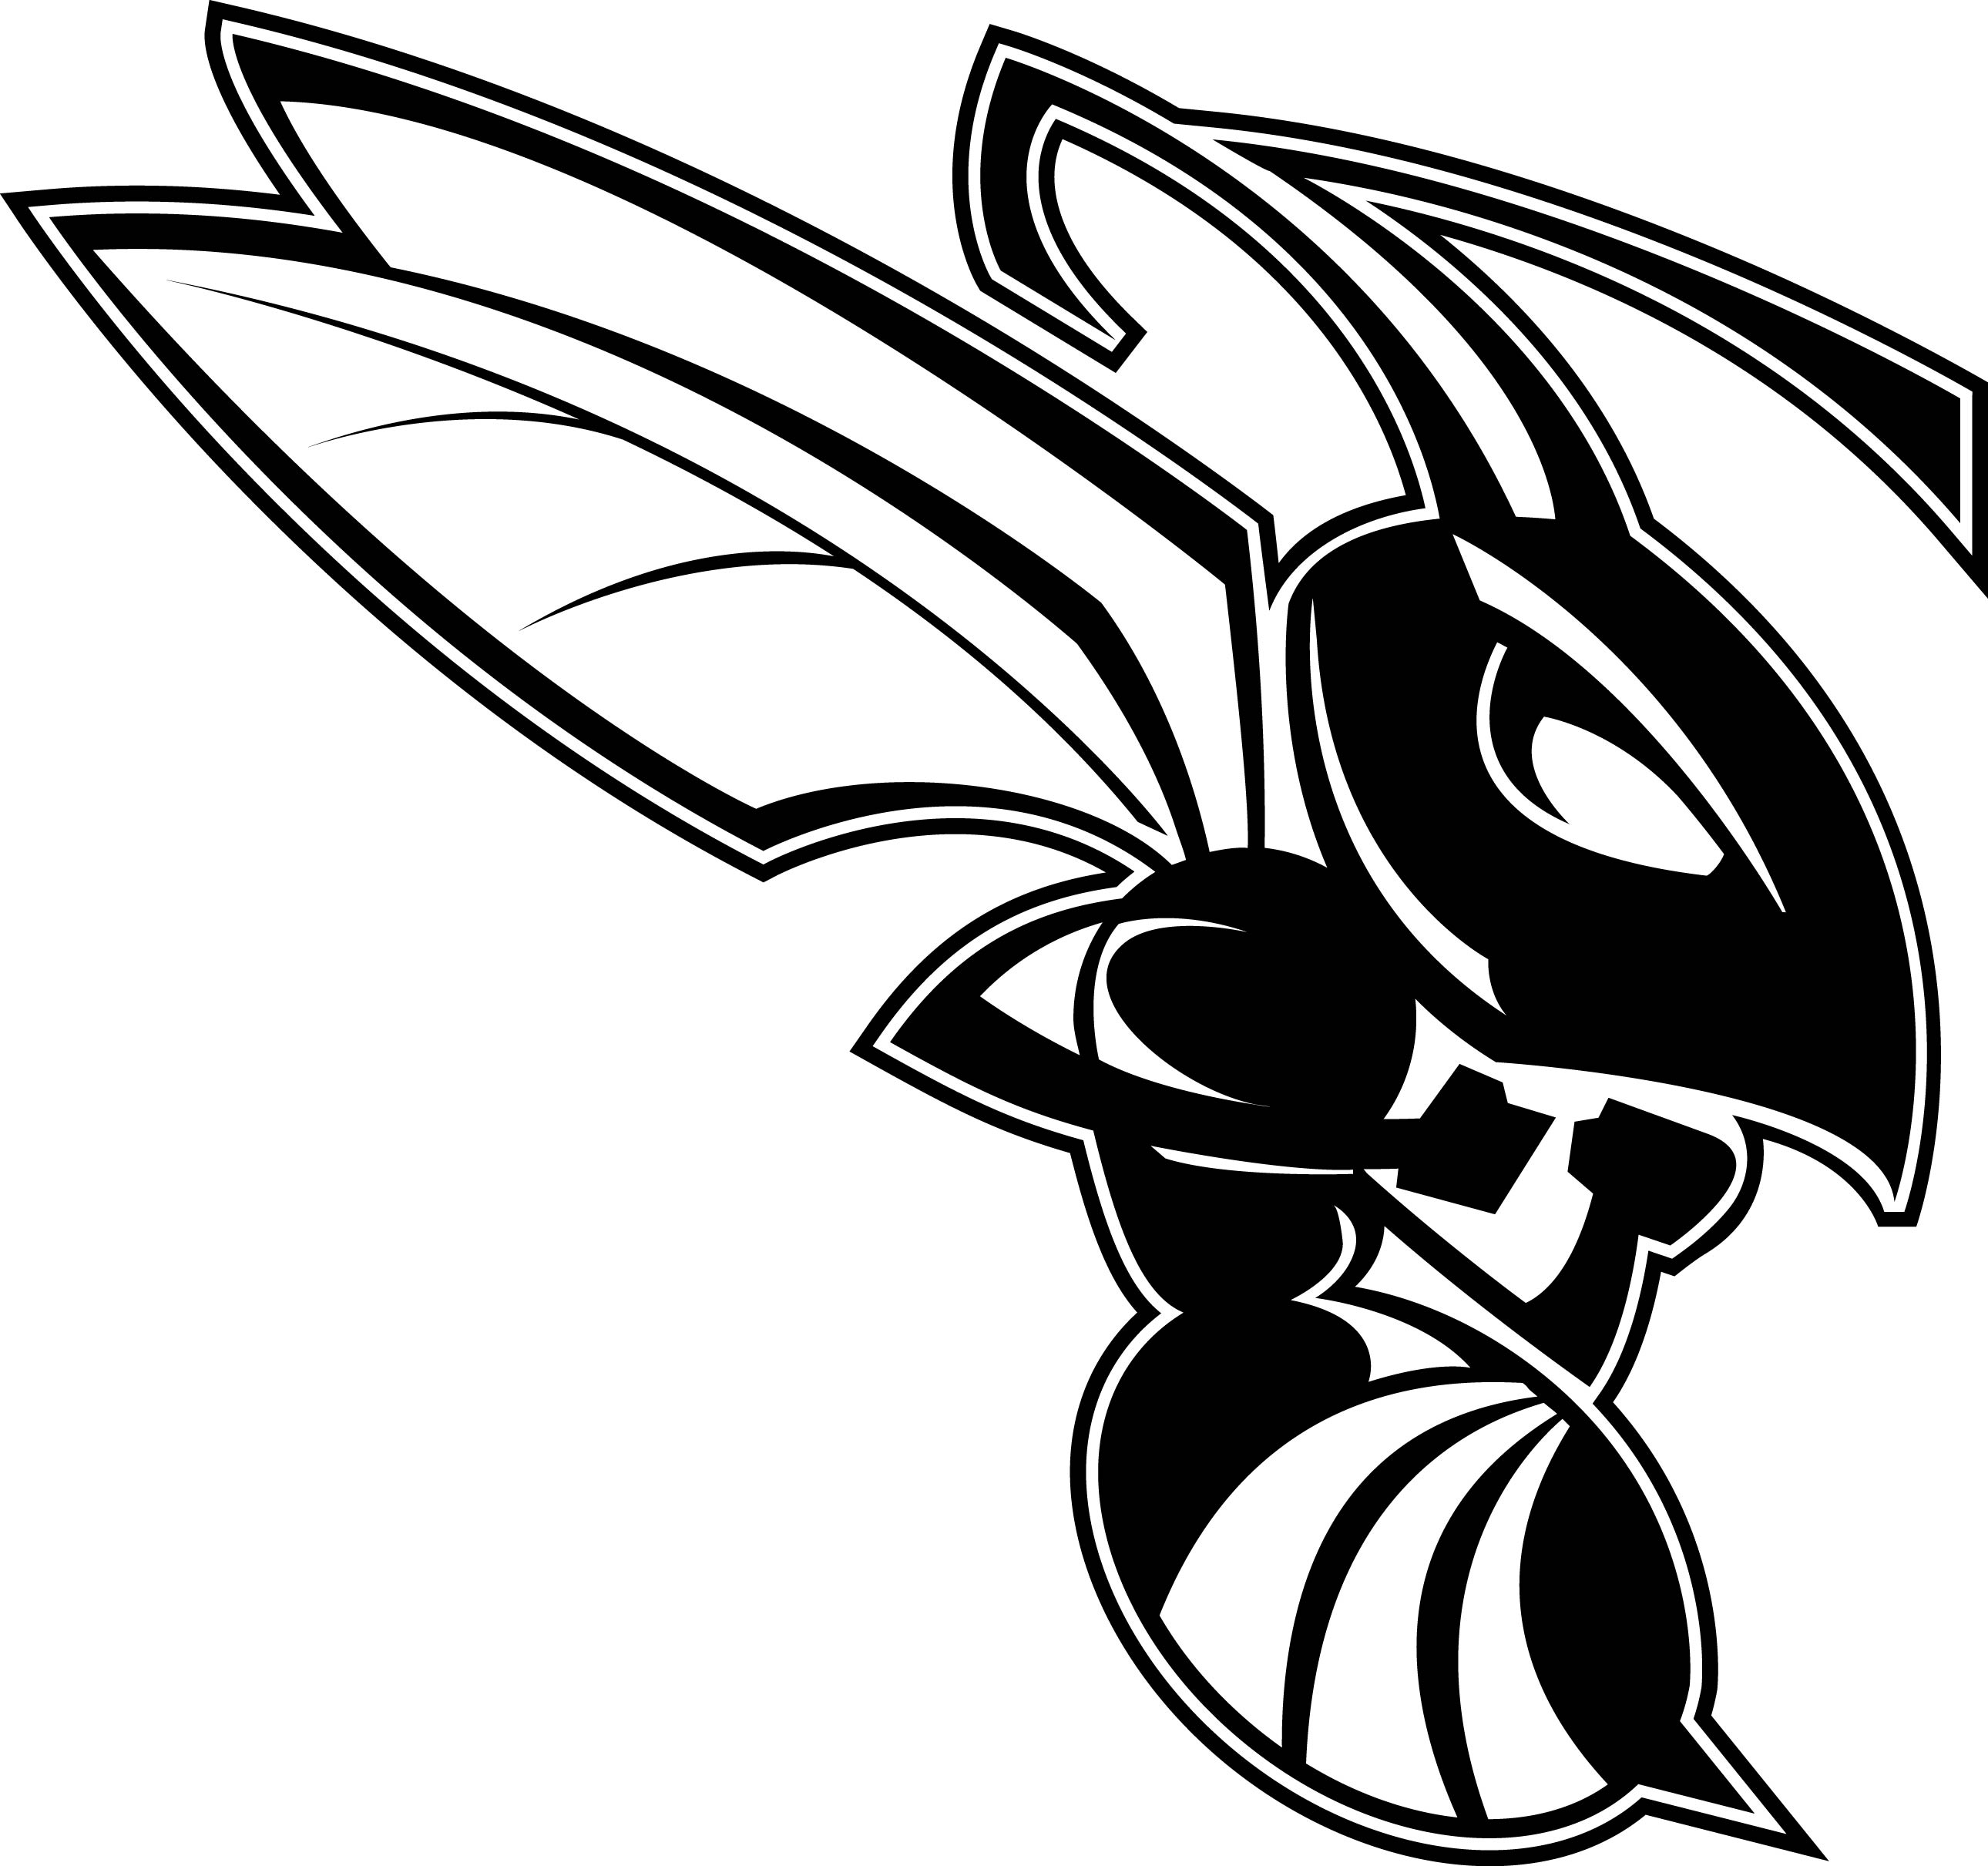 Baldfaced Hornet kills Yellowjacket